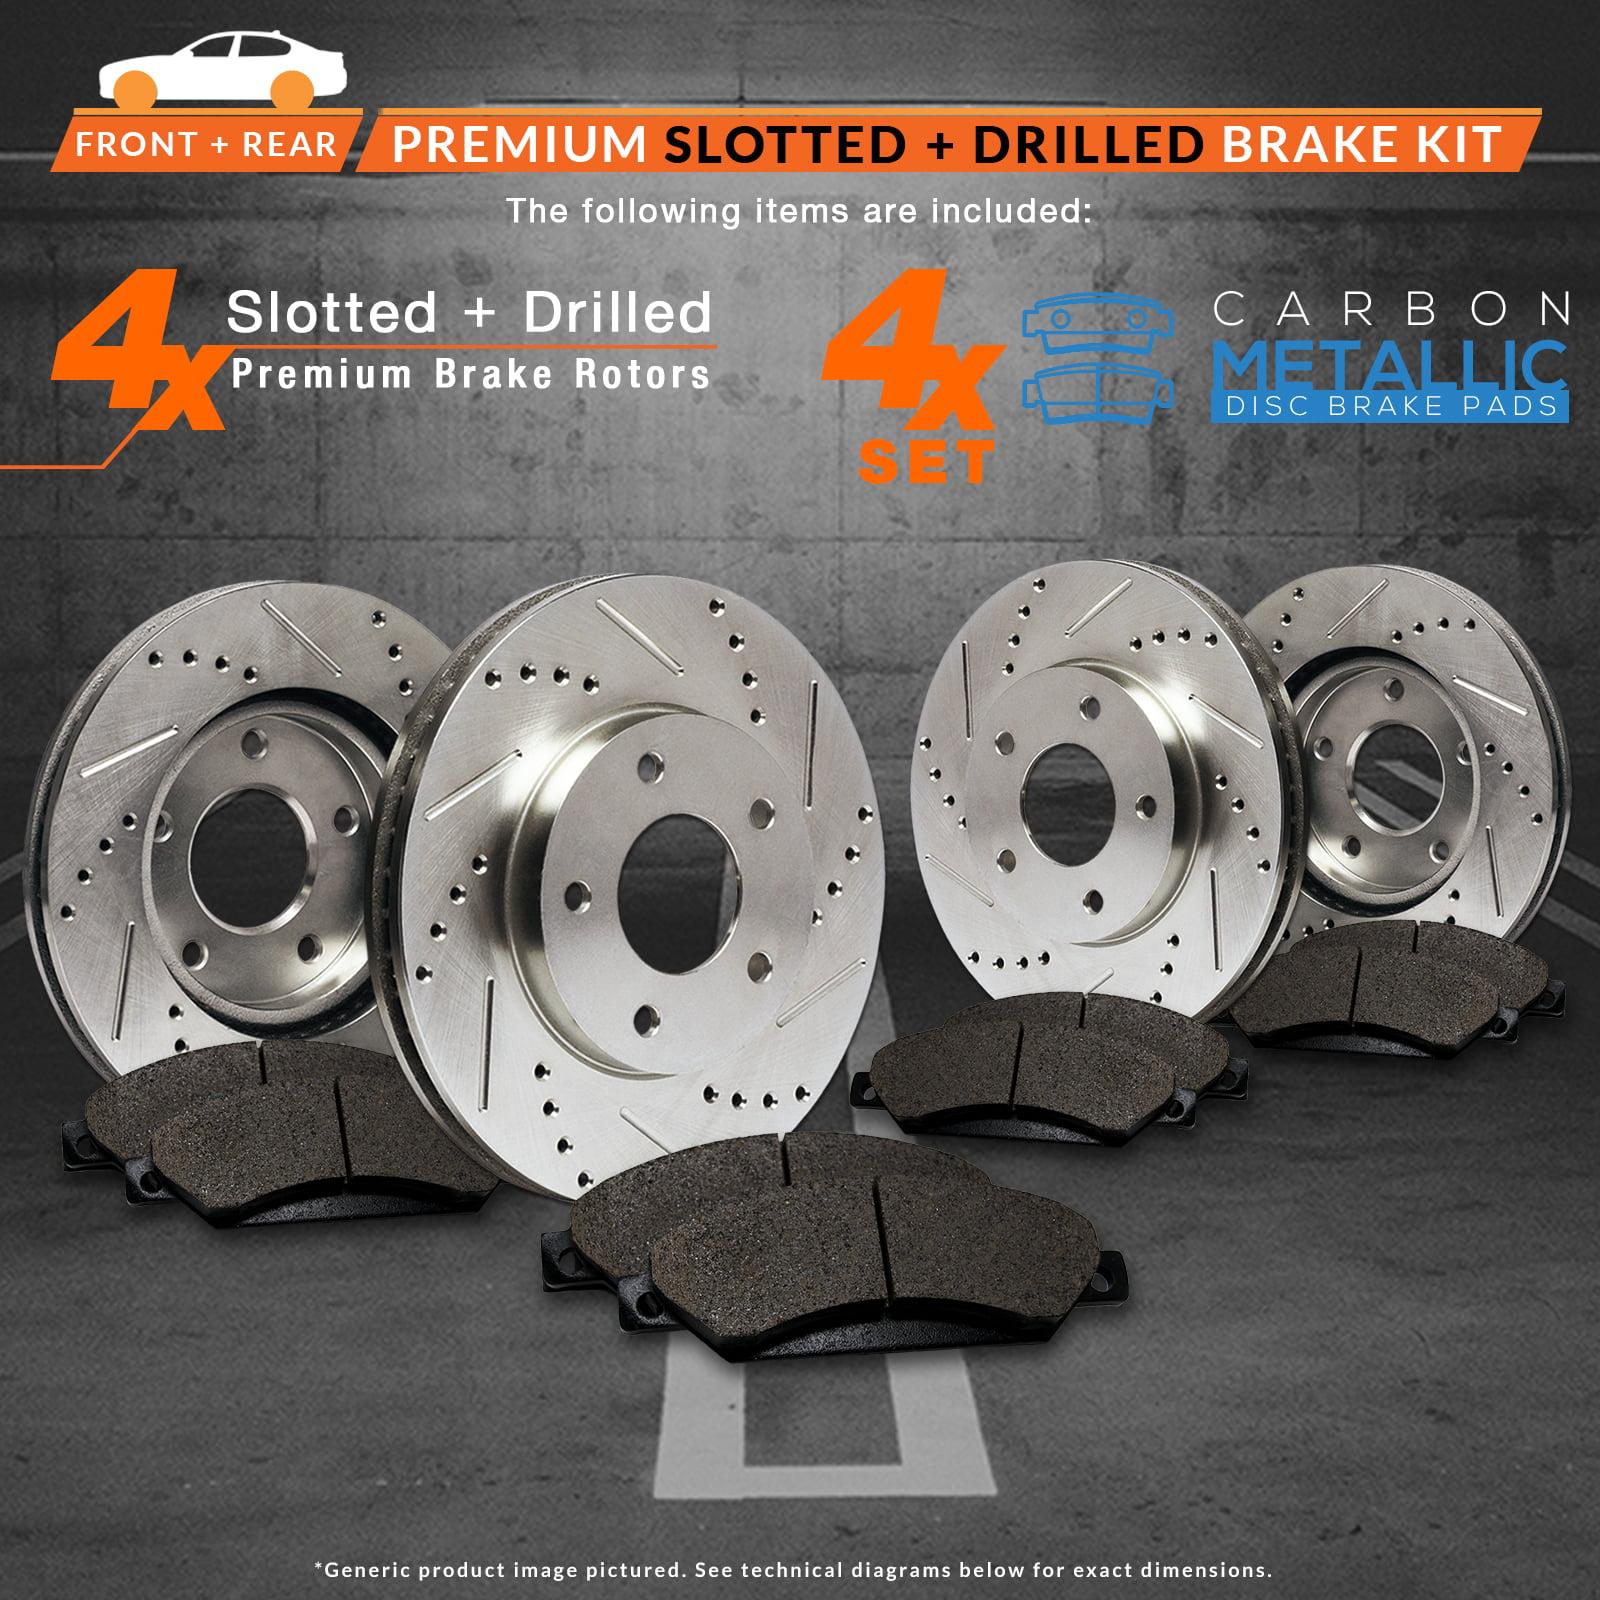 E-Coated Slotted Drilled Rotors + Ceramic Pads KT008183 Max Brakes Front /& Rear Elite Brake Kit Fits: 2006 06 2007 07 2008 08 Honda Civic EX//EX-L